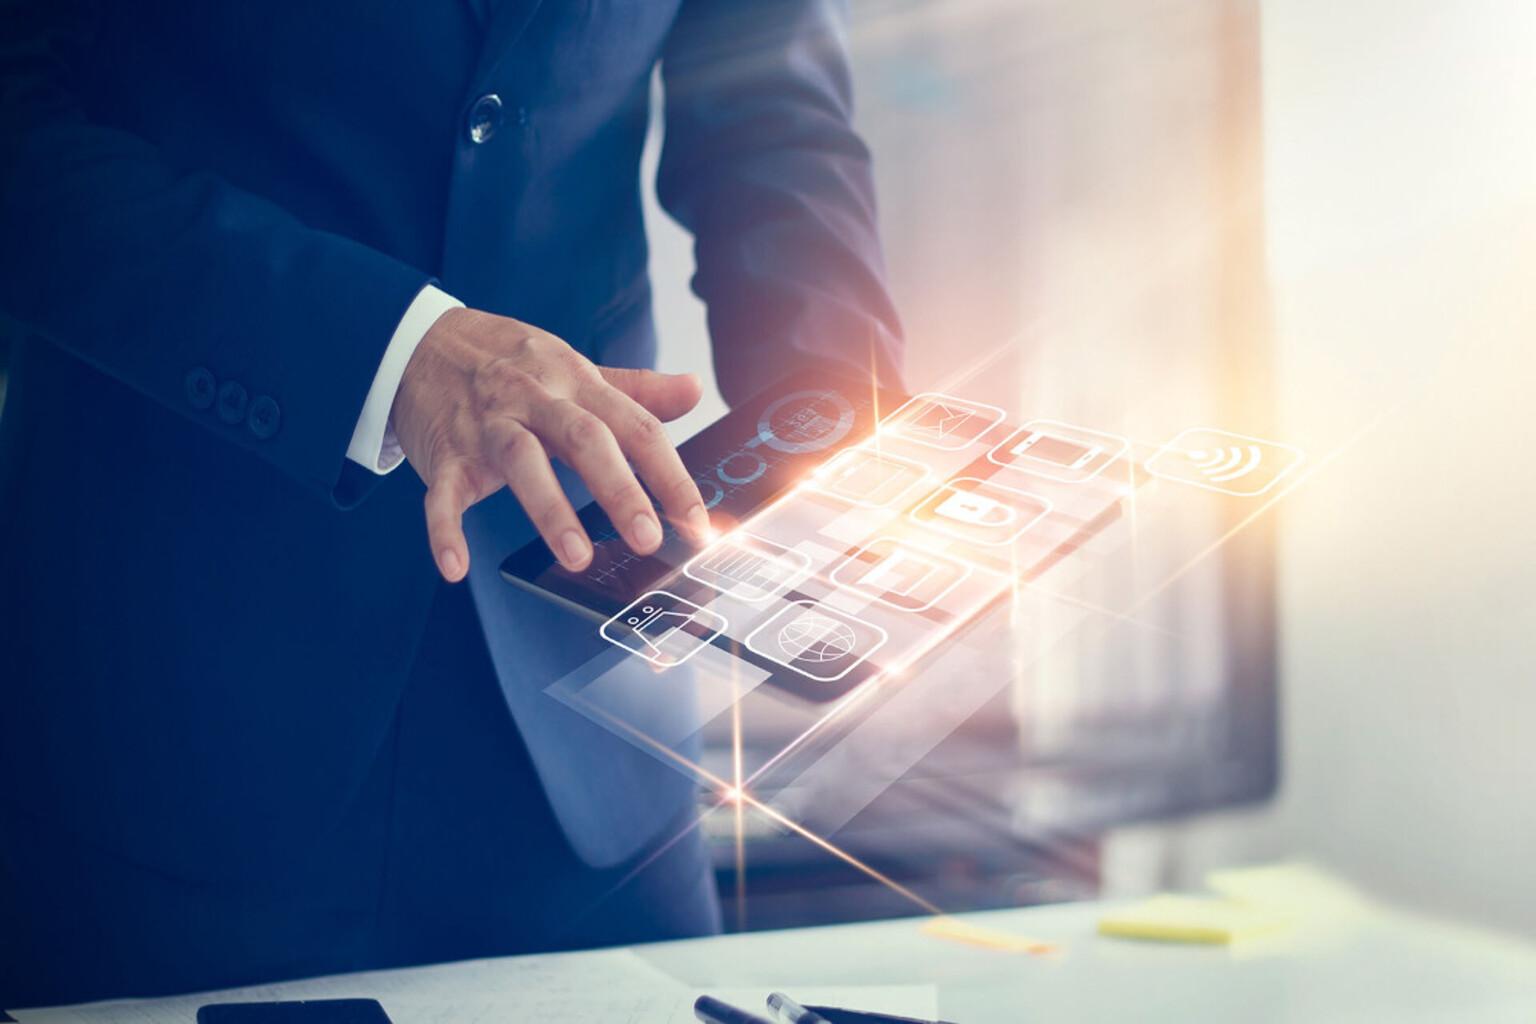 budgeting-planning-analytic-information-hub